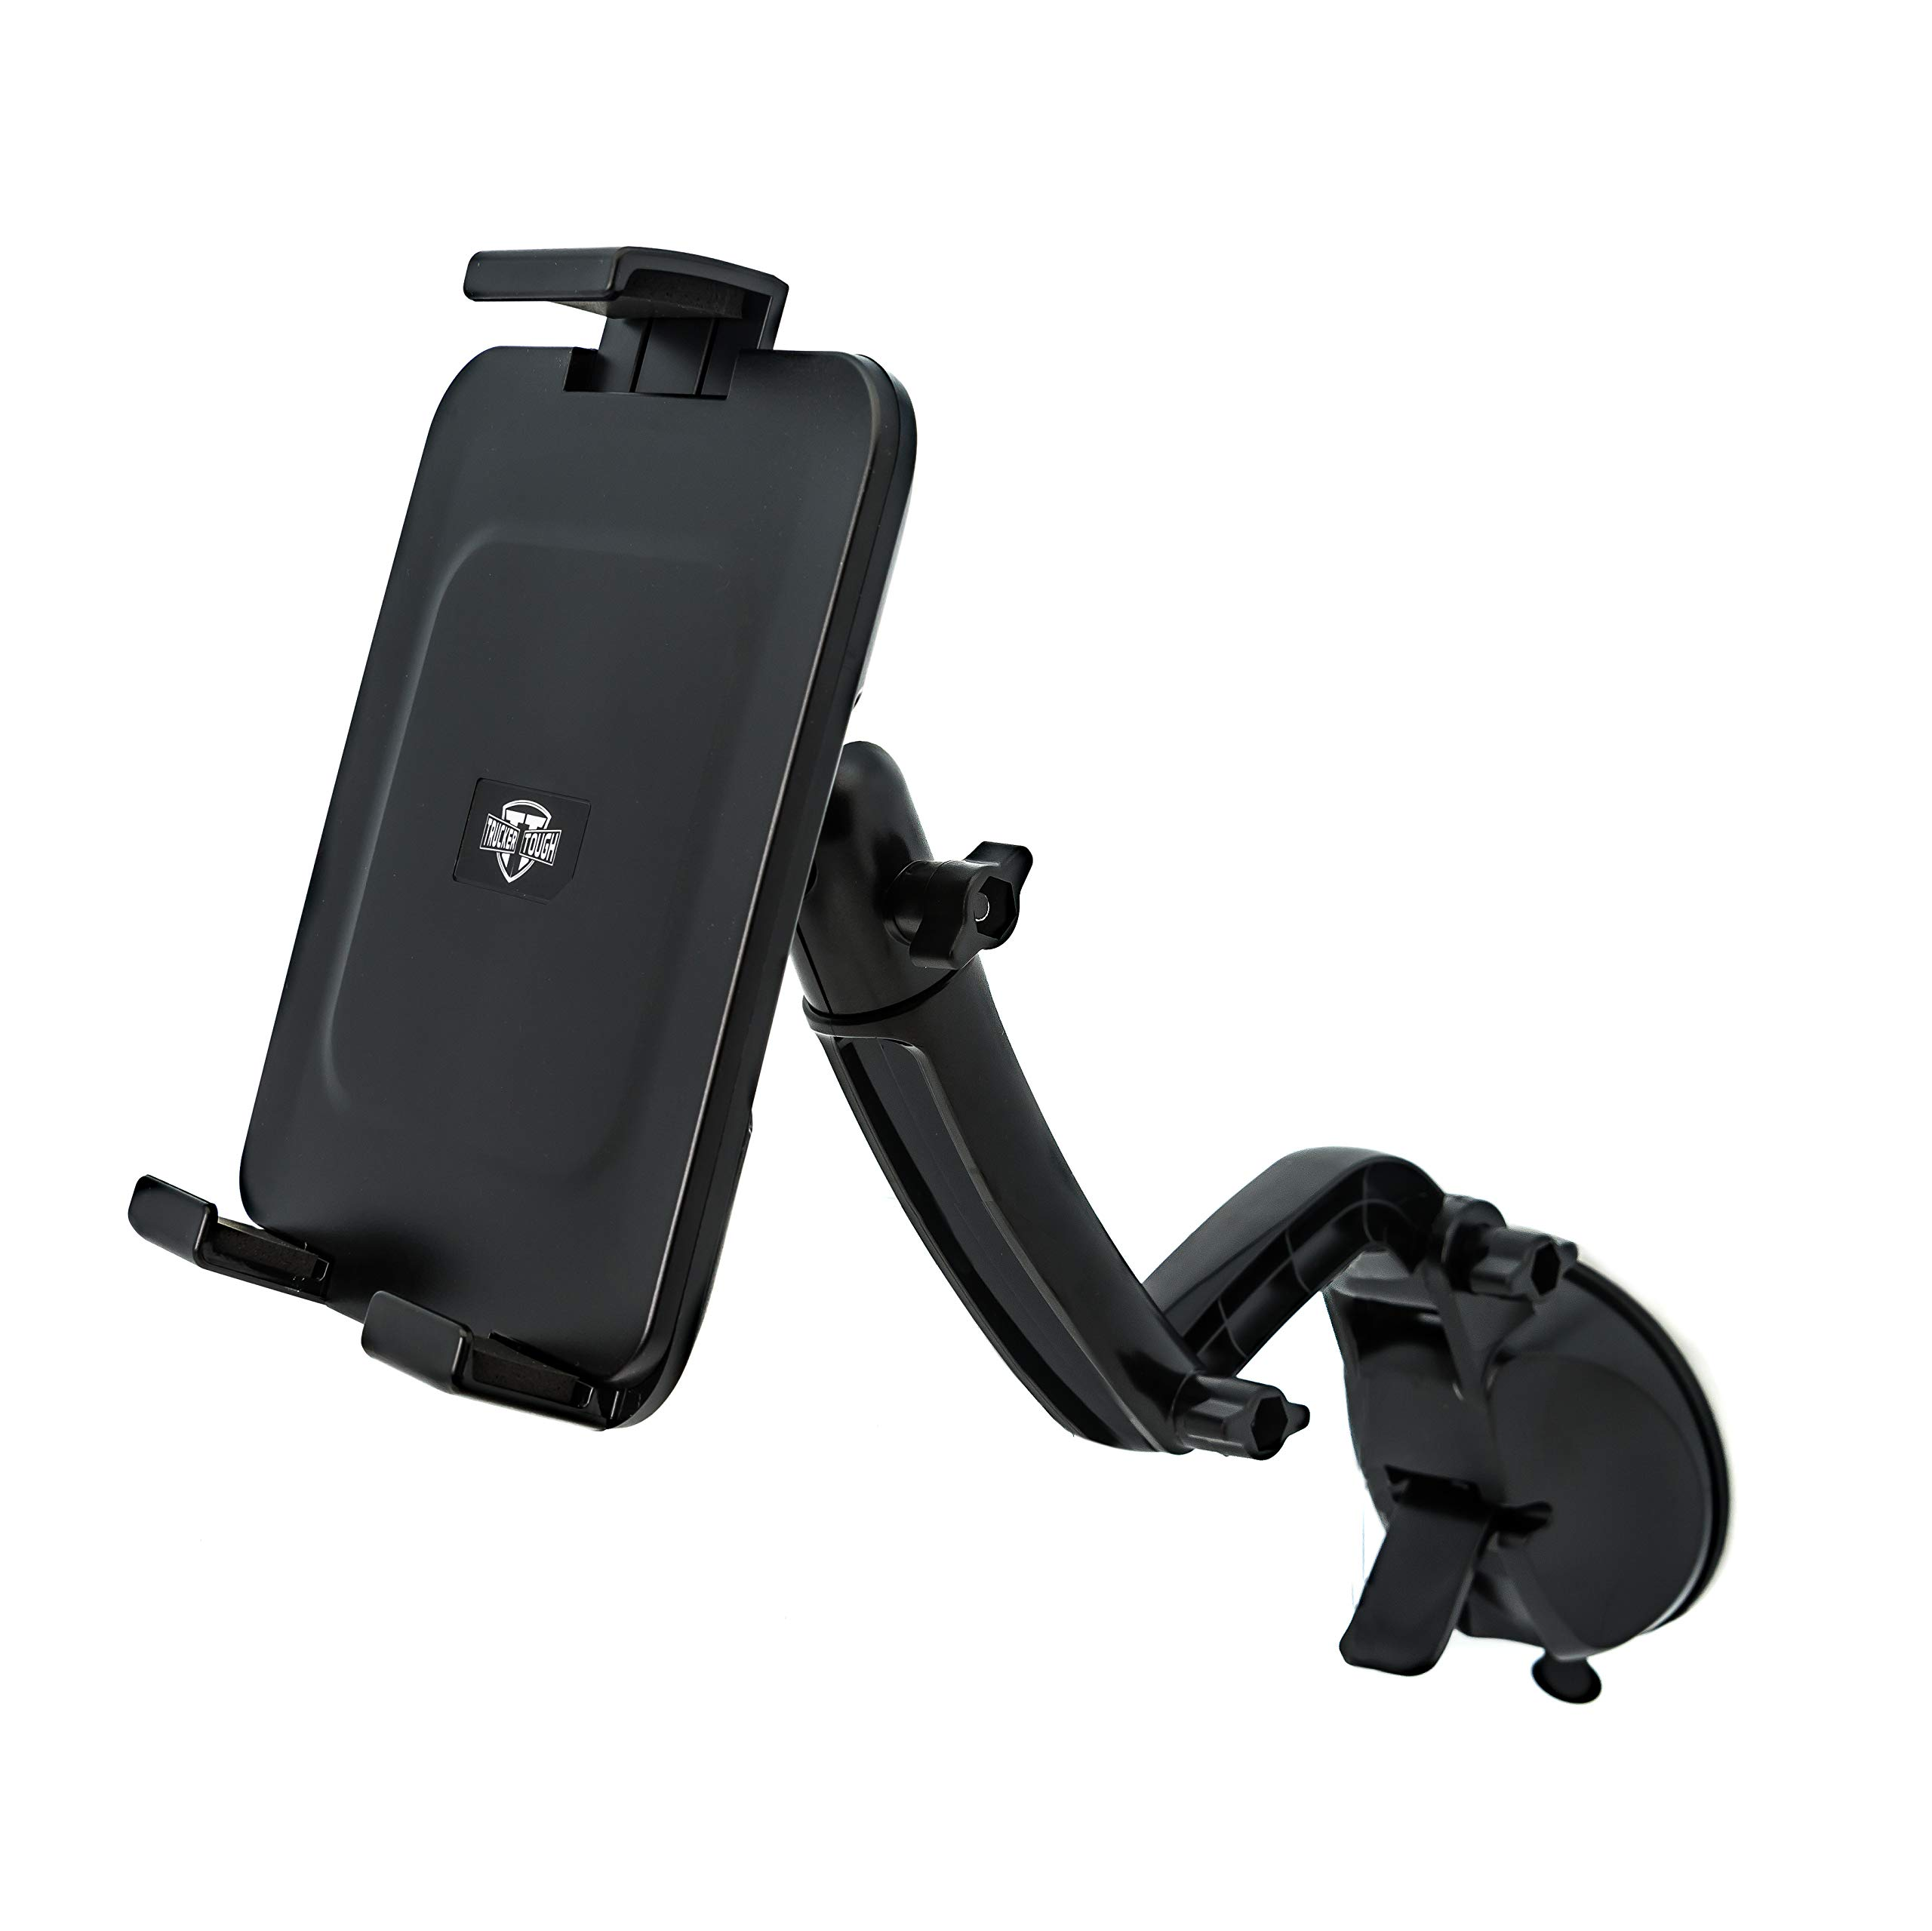 Trucker Tough Tablet Mount Holder for ELD GPS Garmin Nuvi Tomtom Via Go Magellan DashCam Navigator & Phablet-Style Smartphone Devices in Cars and Trucks TT1-616-1